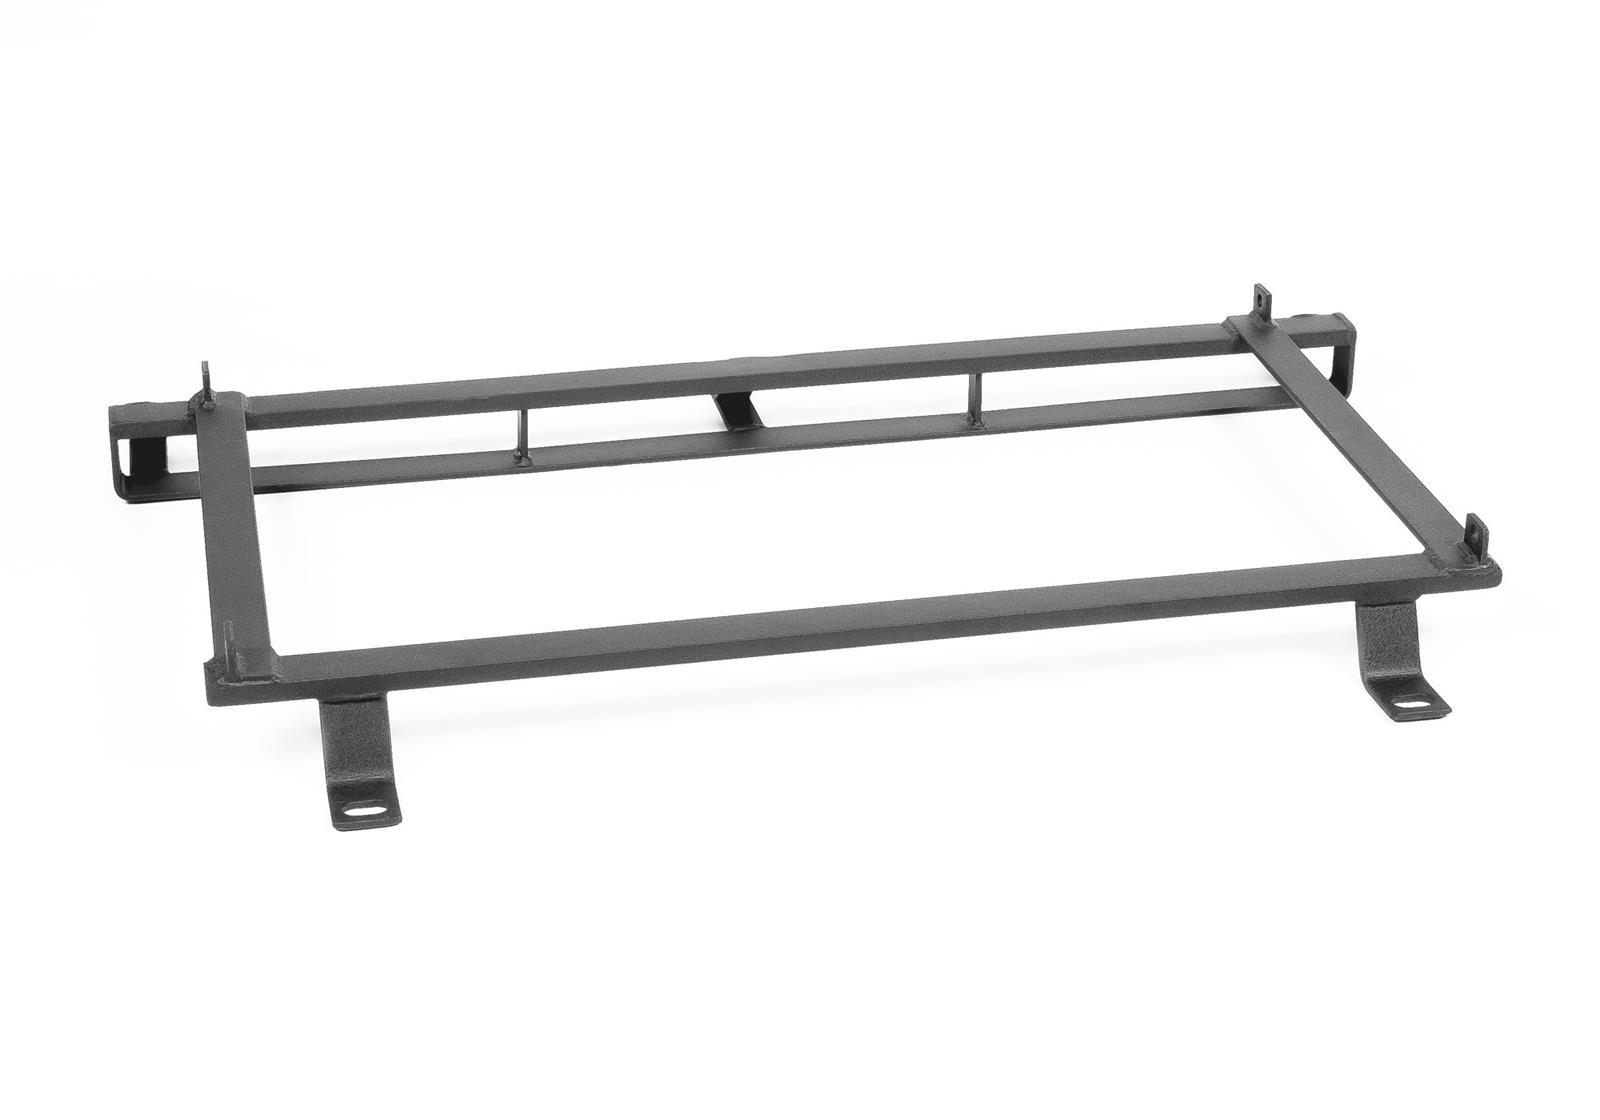 Corbeau Baja Bench Seat Brackets B36221 Free Shipping On Orders